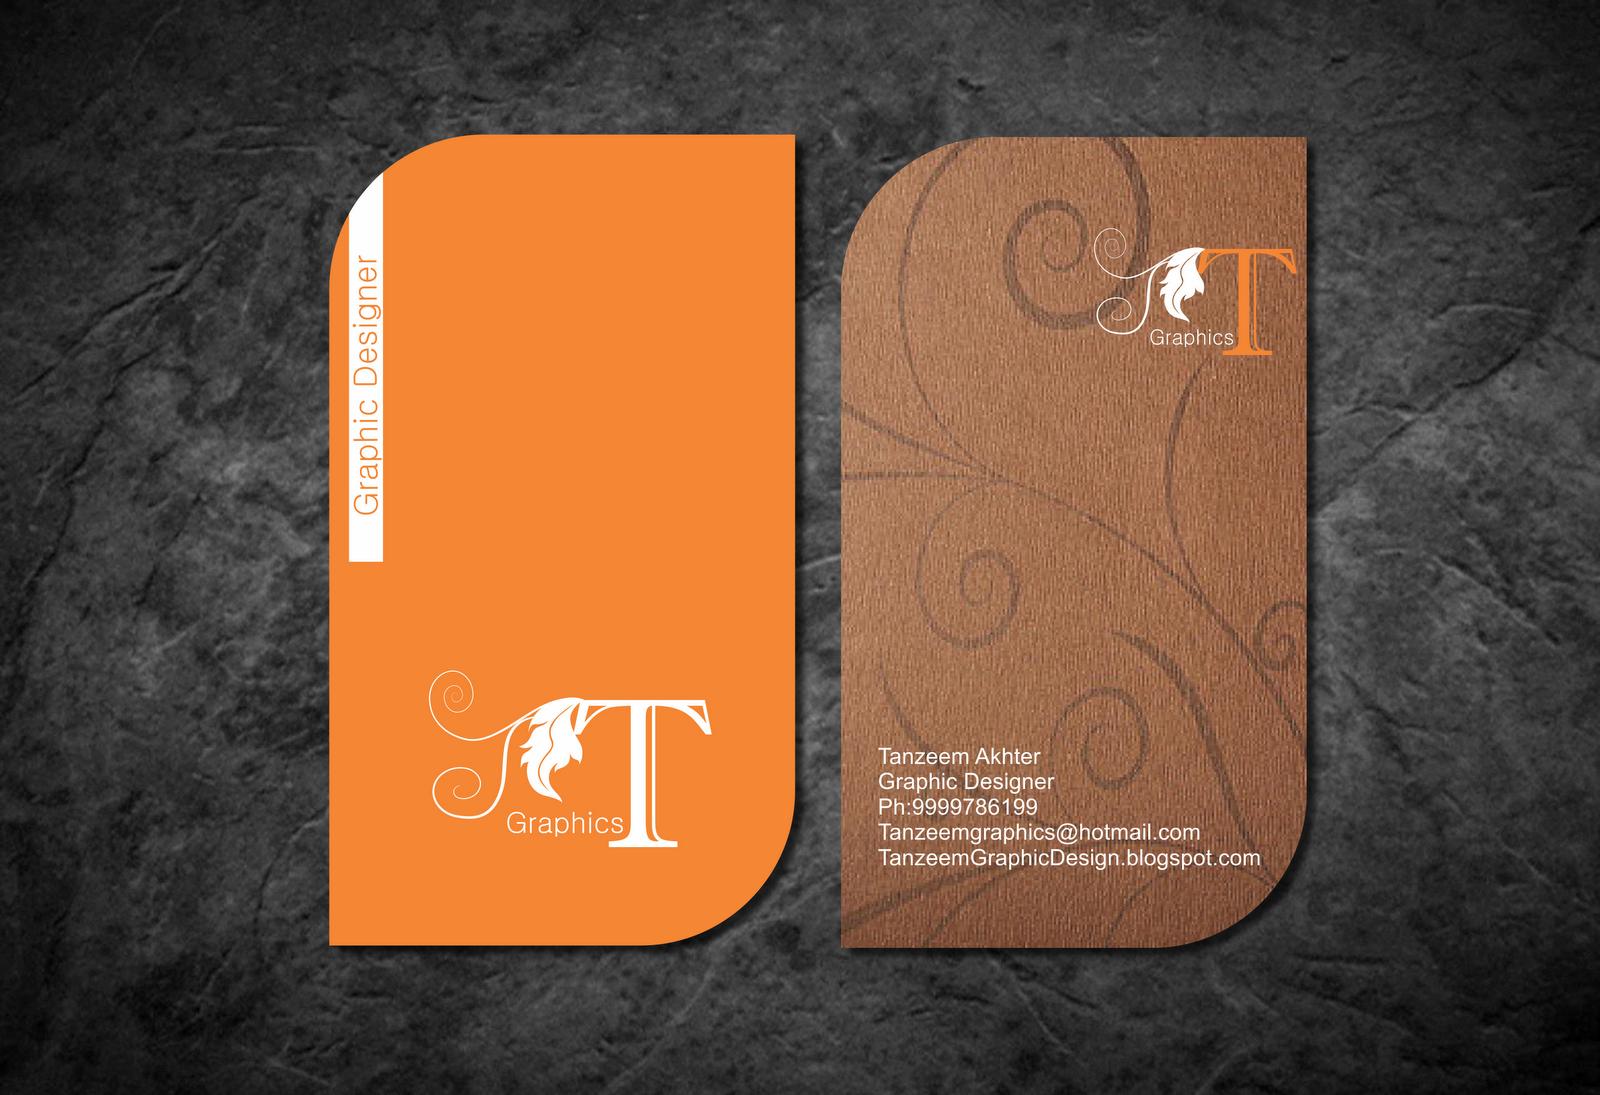 Coreldraw visiting card - Logo Visiting Card In Coreldraw Illustrator